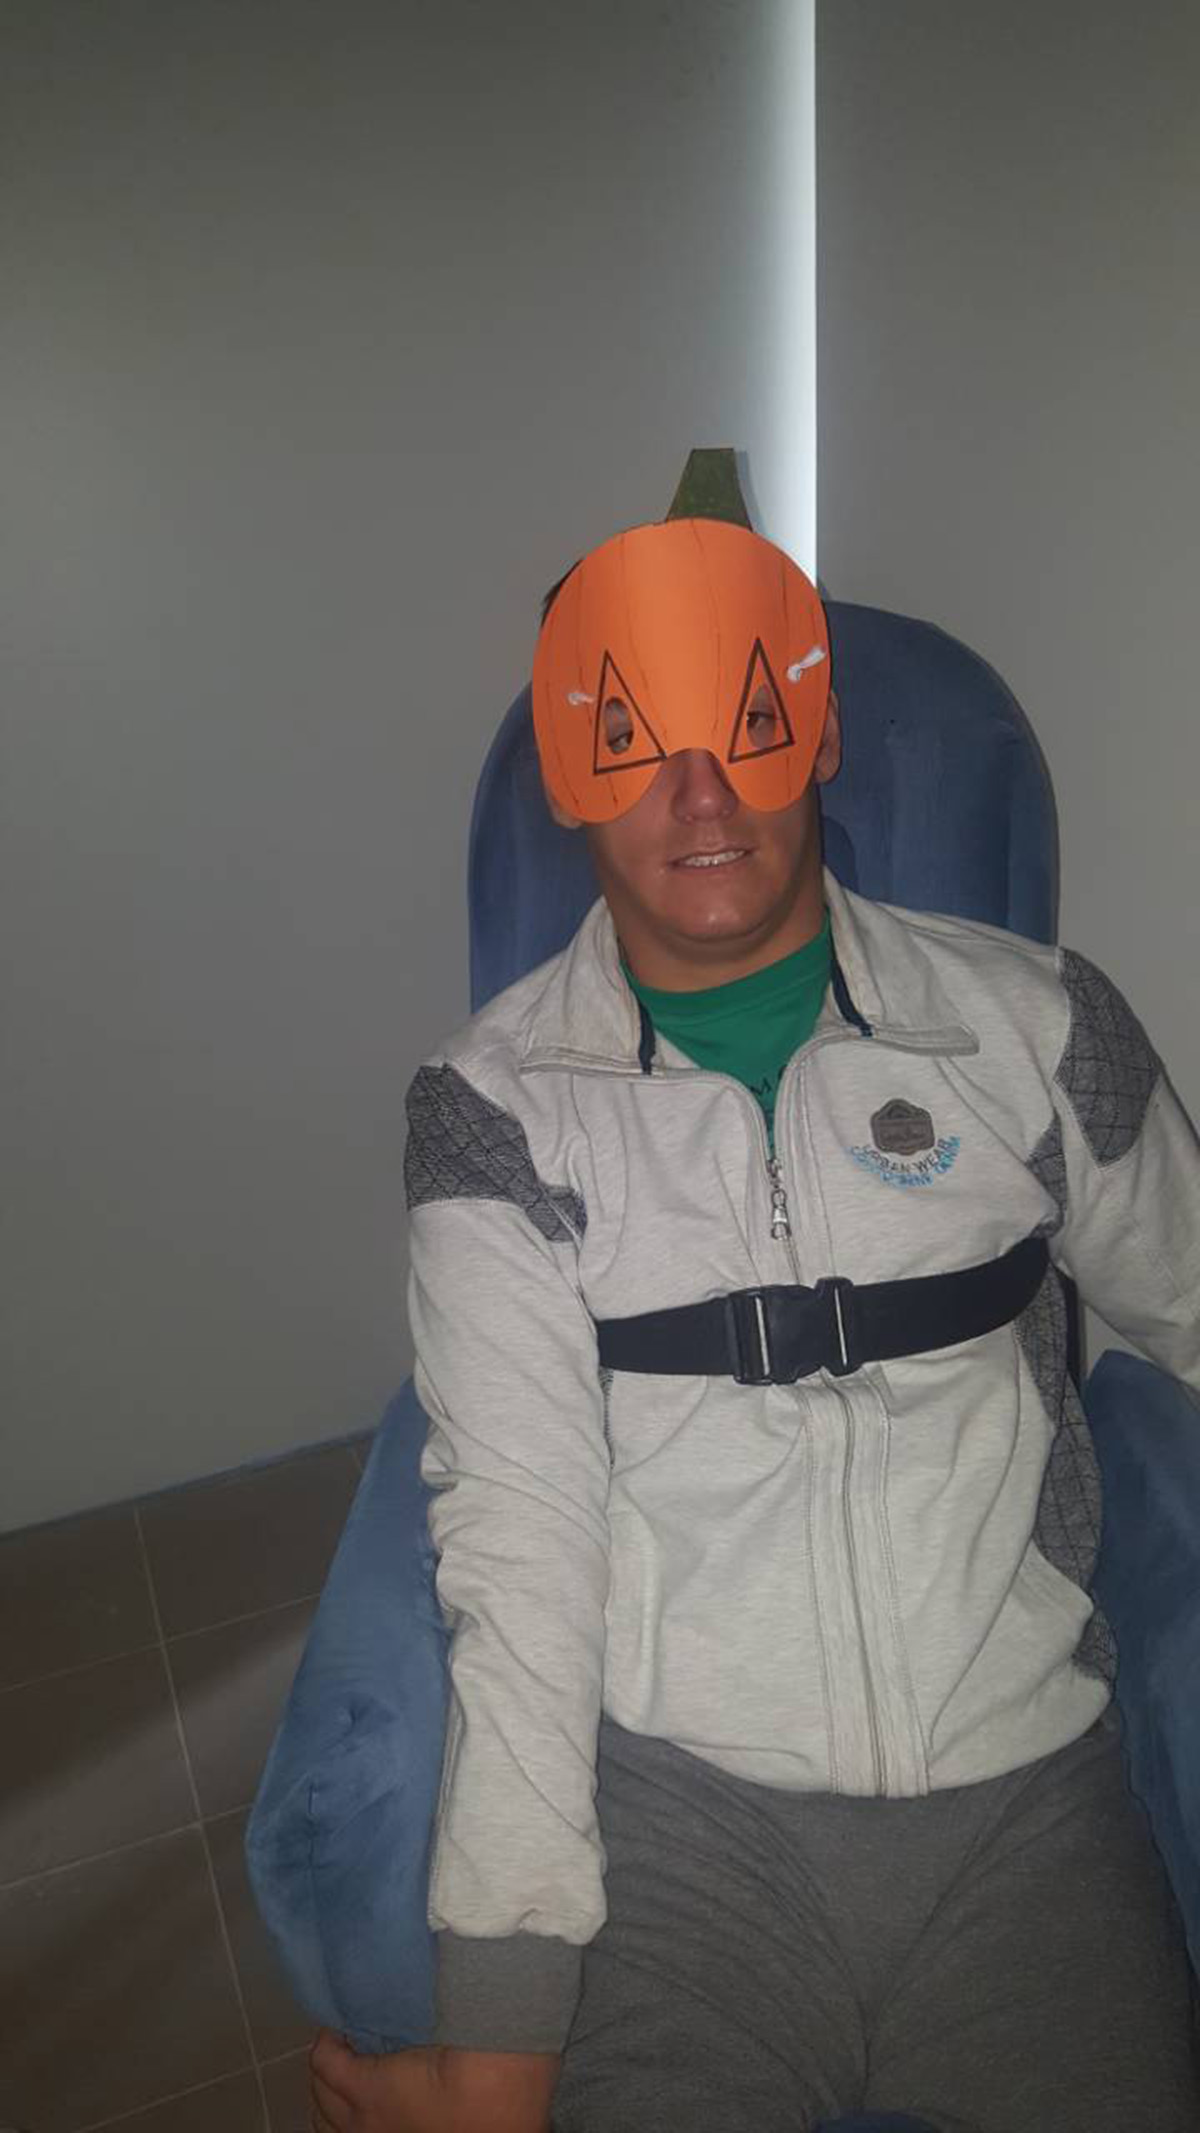 hallowen6.jpg